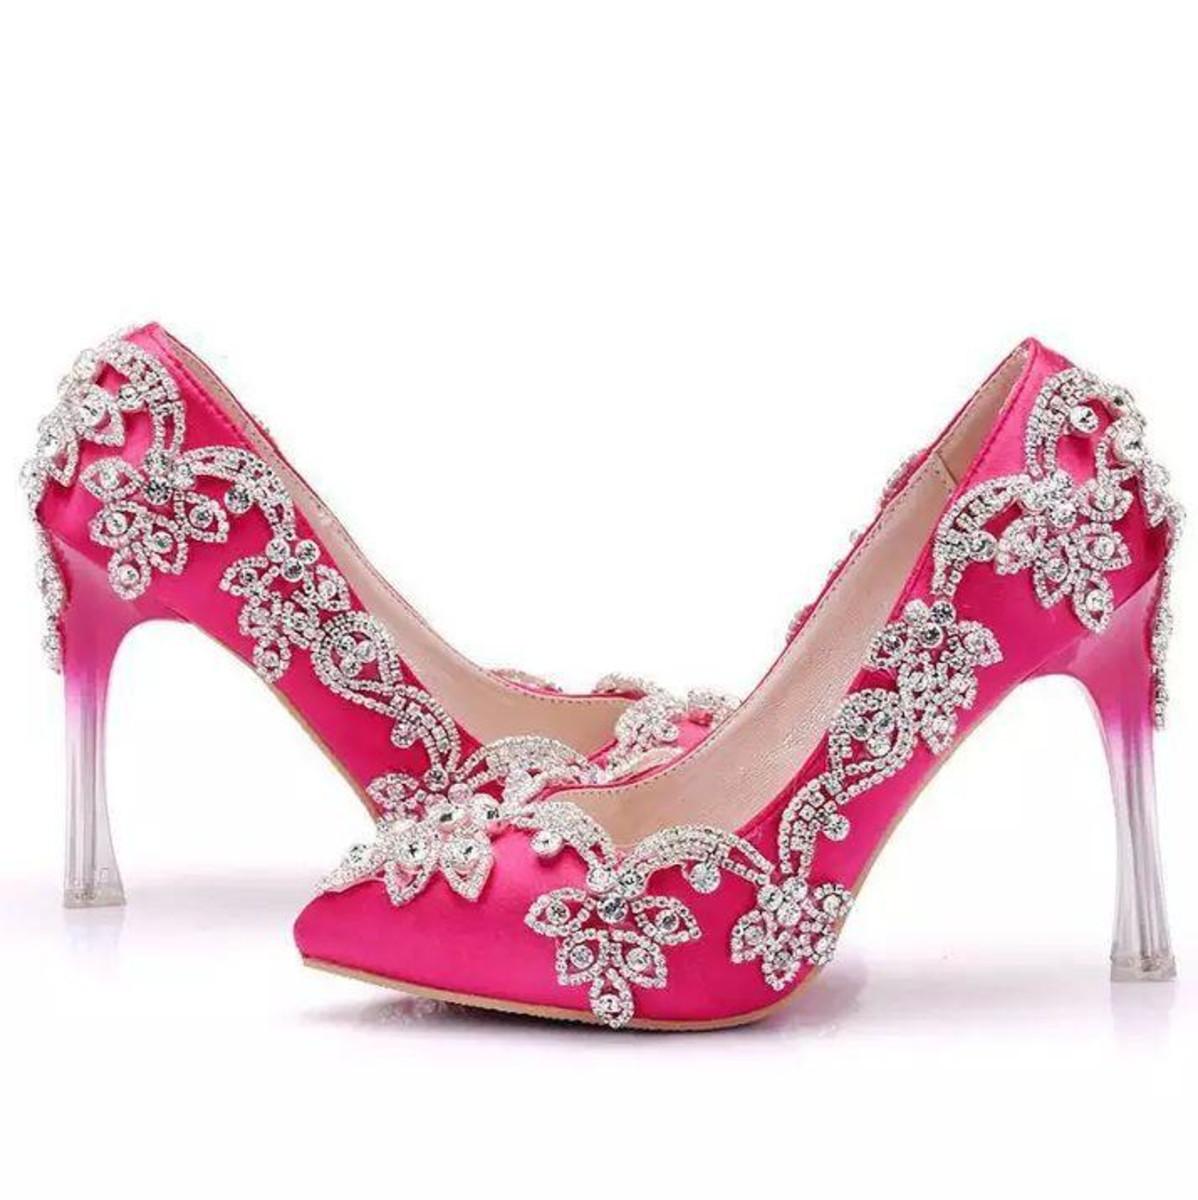 7adf2ef3d1 Sapato de Debutante noiva personalizado rosa strass no Elo7 ...